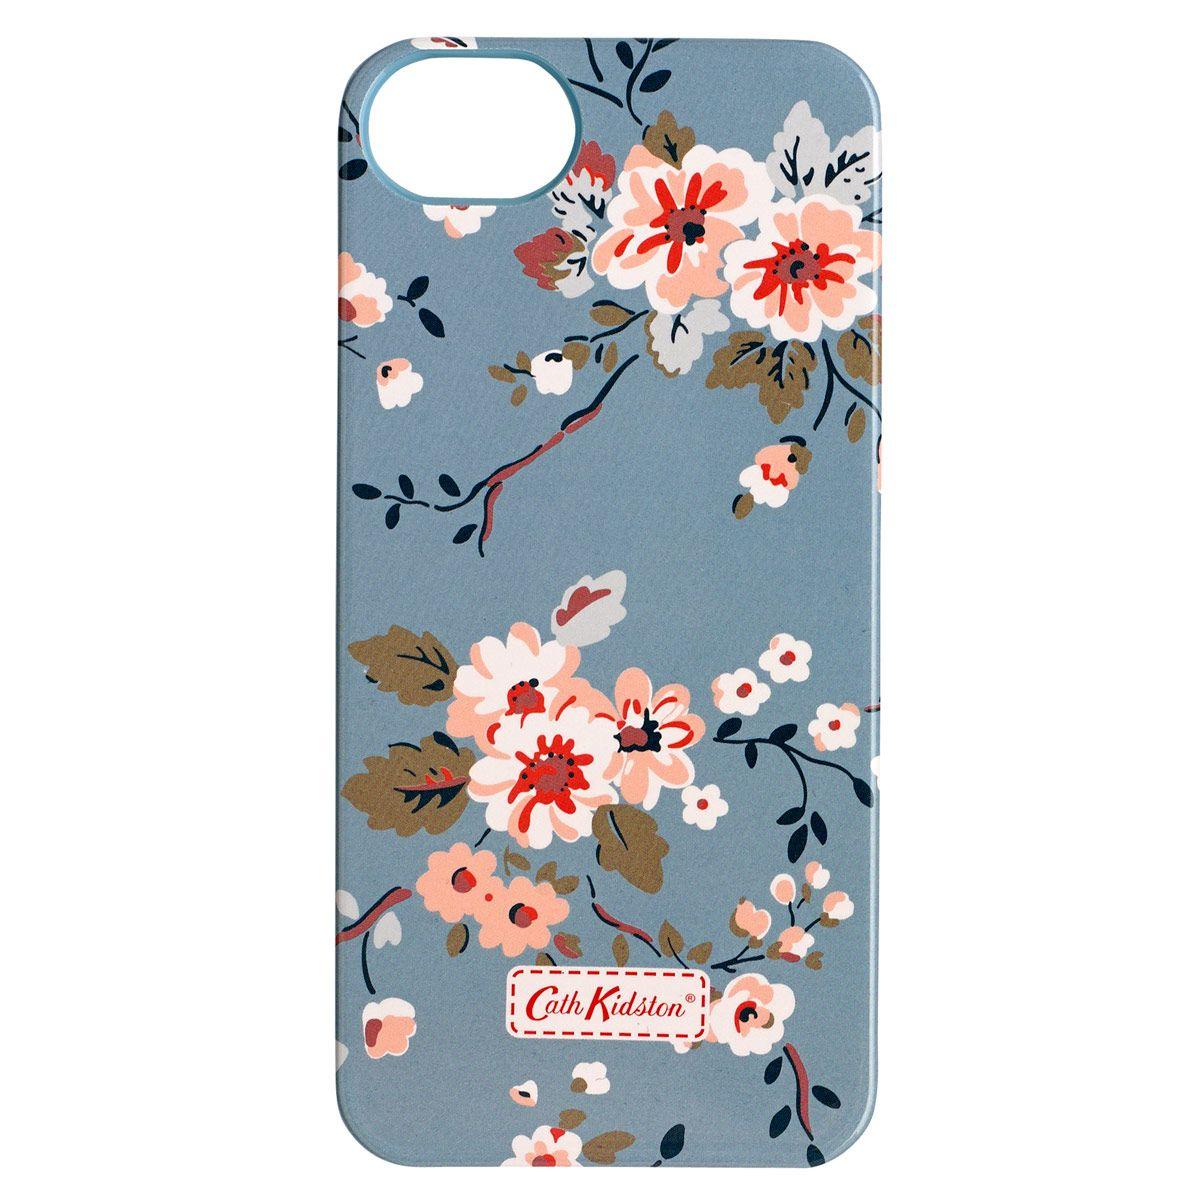 Trailing Rose Iphone 5 Case